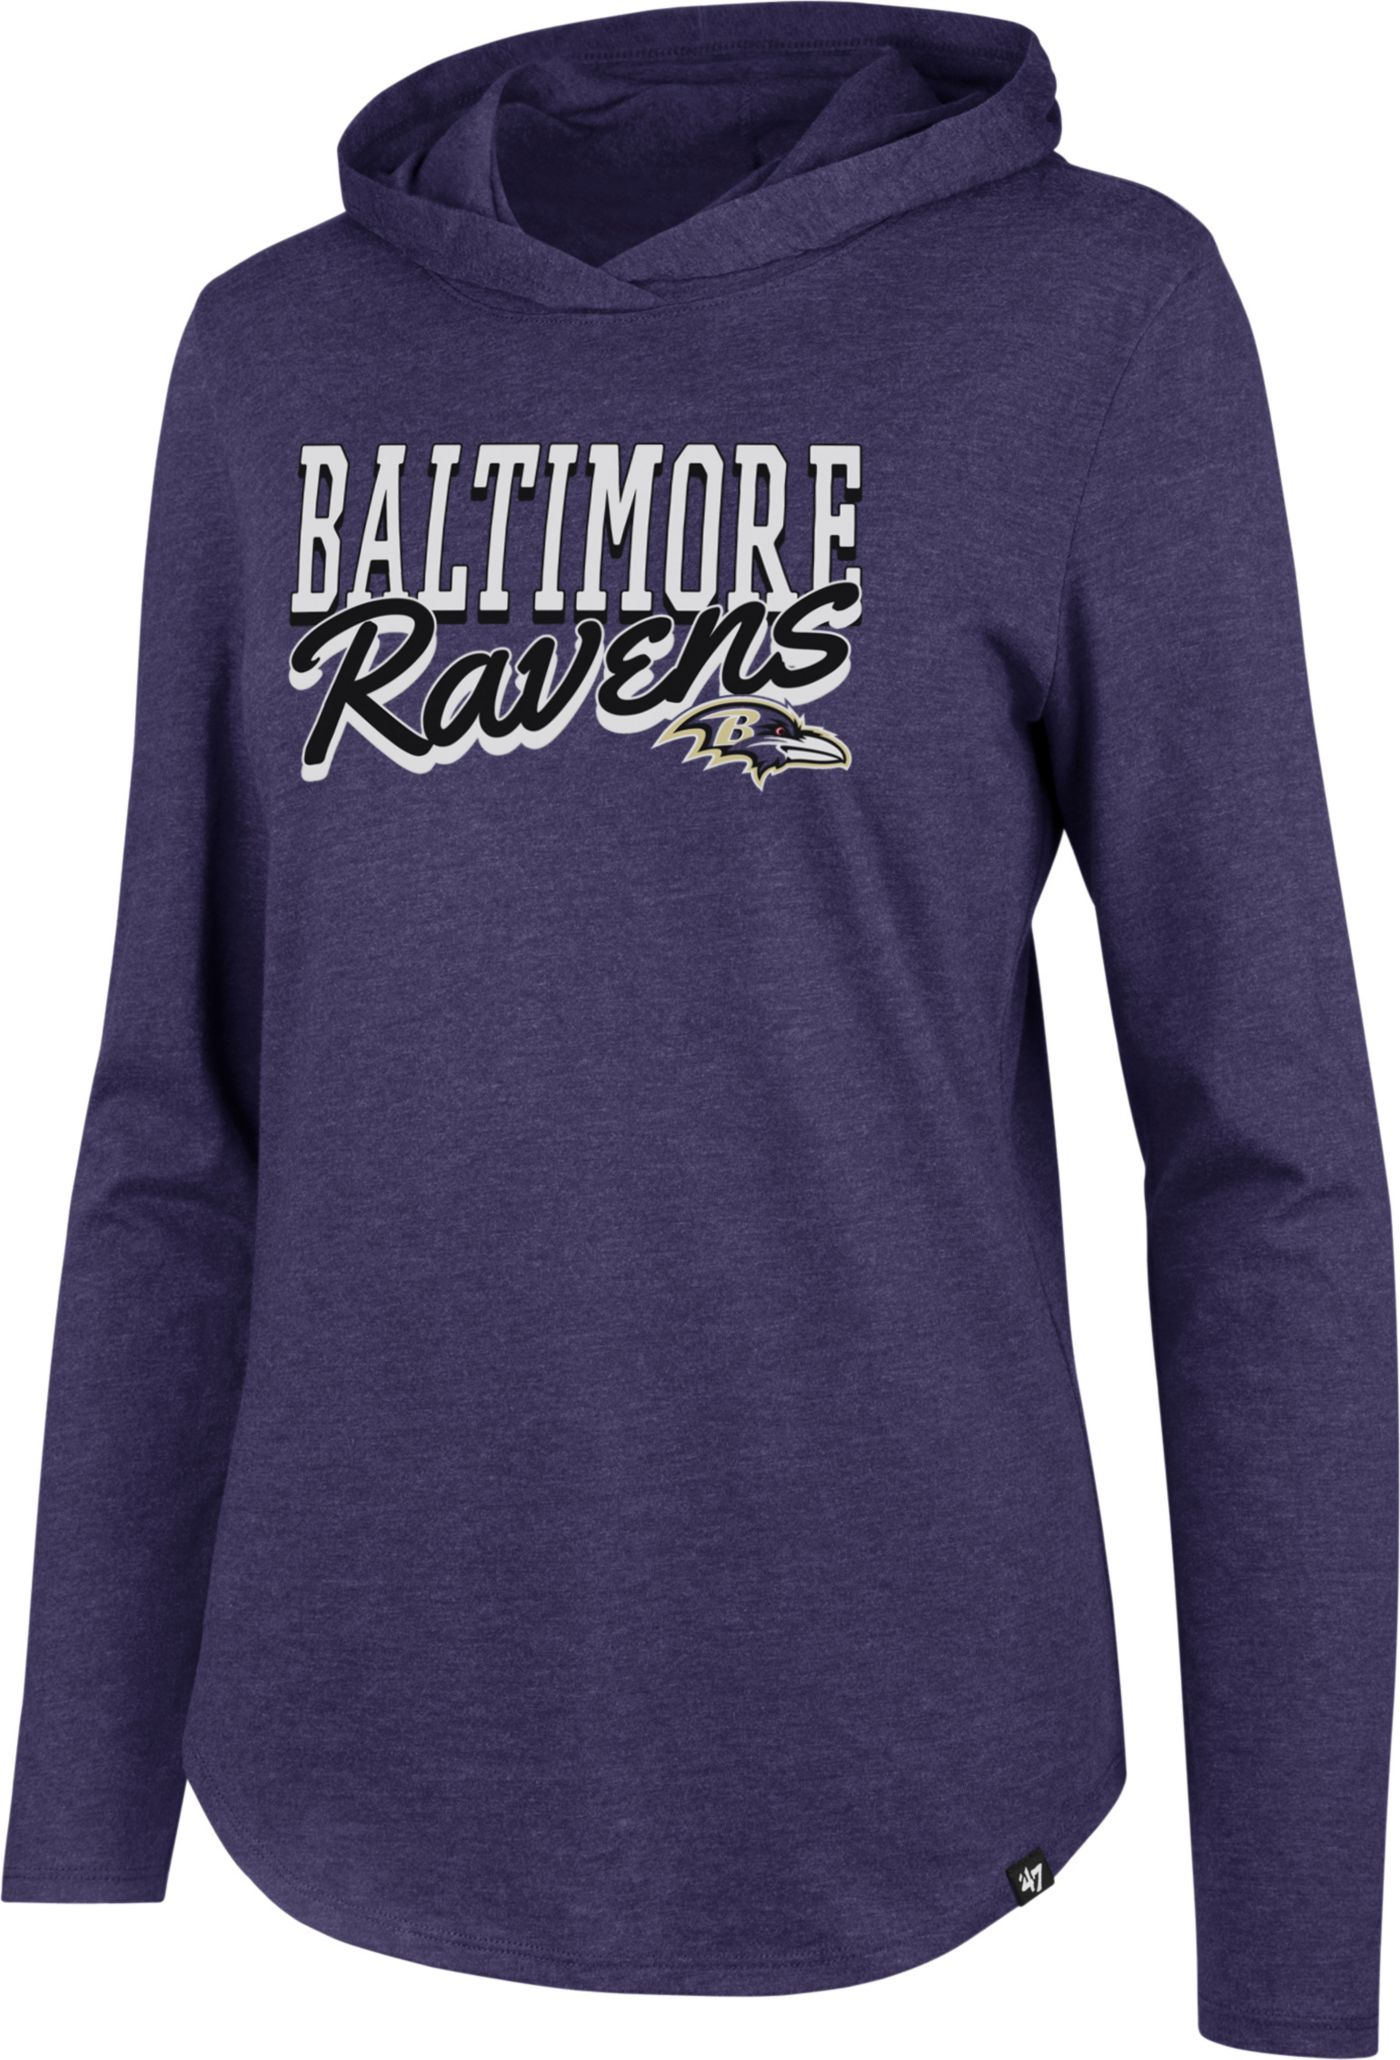 '47 Women's Baltimore Ravens Club Purple Hooded Long Sleeve Shirt